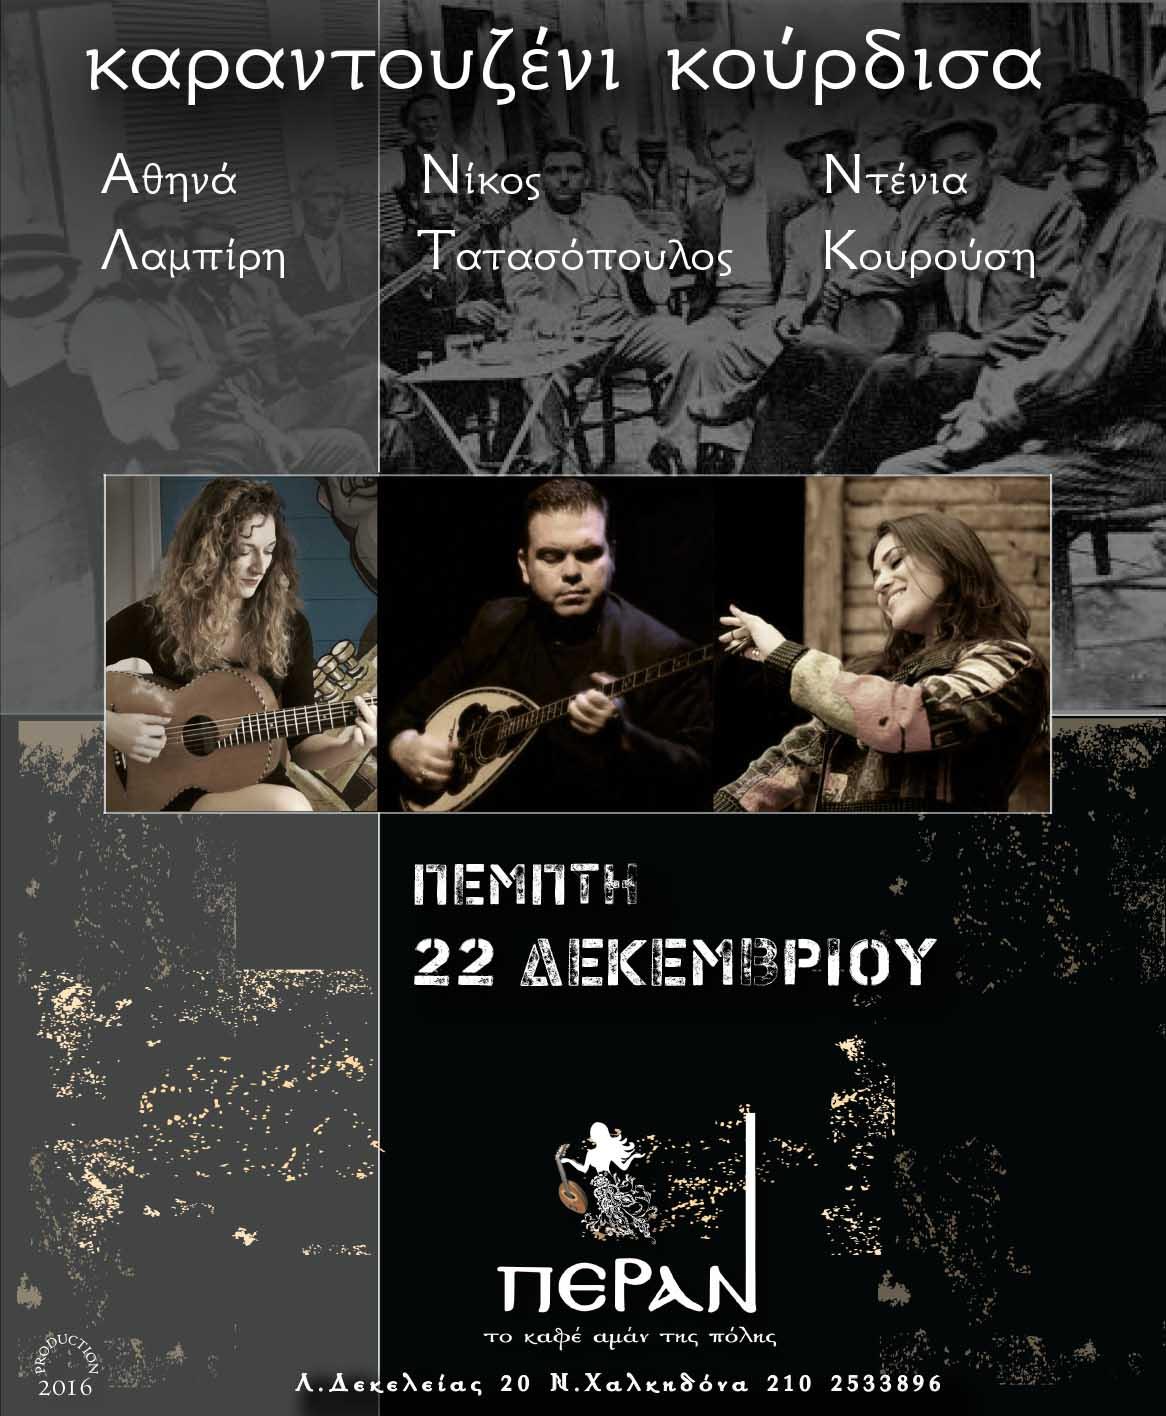 TATASOPOYLOS-KOYROYSI 22-12